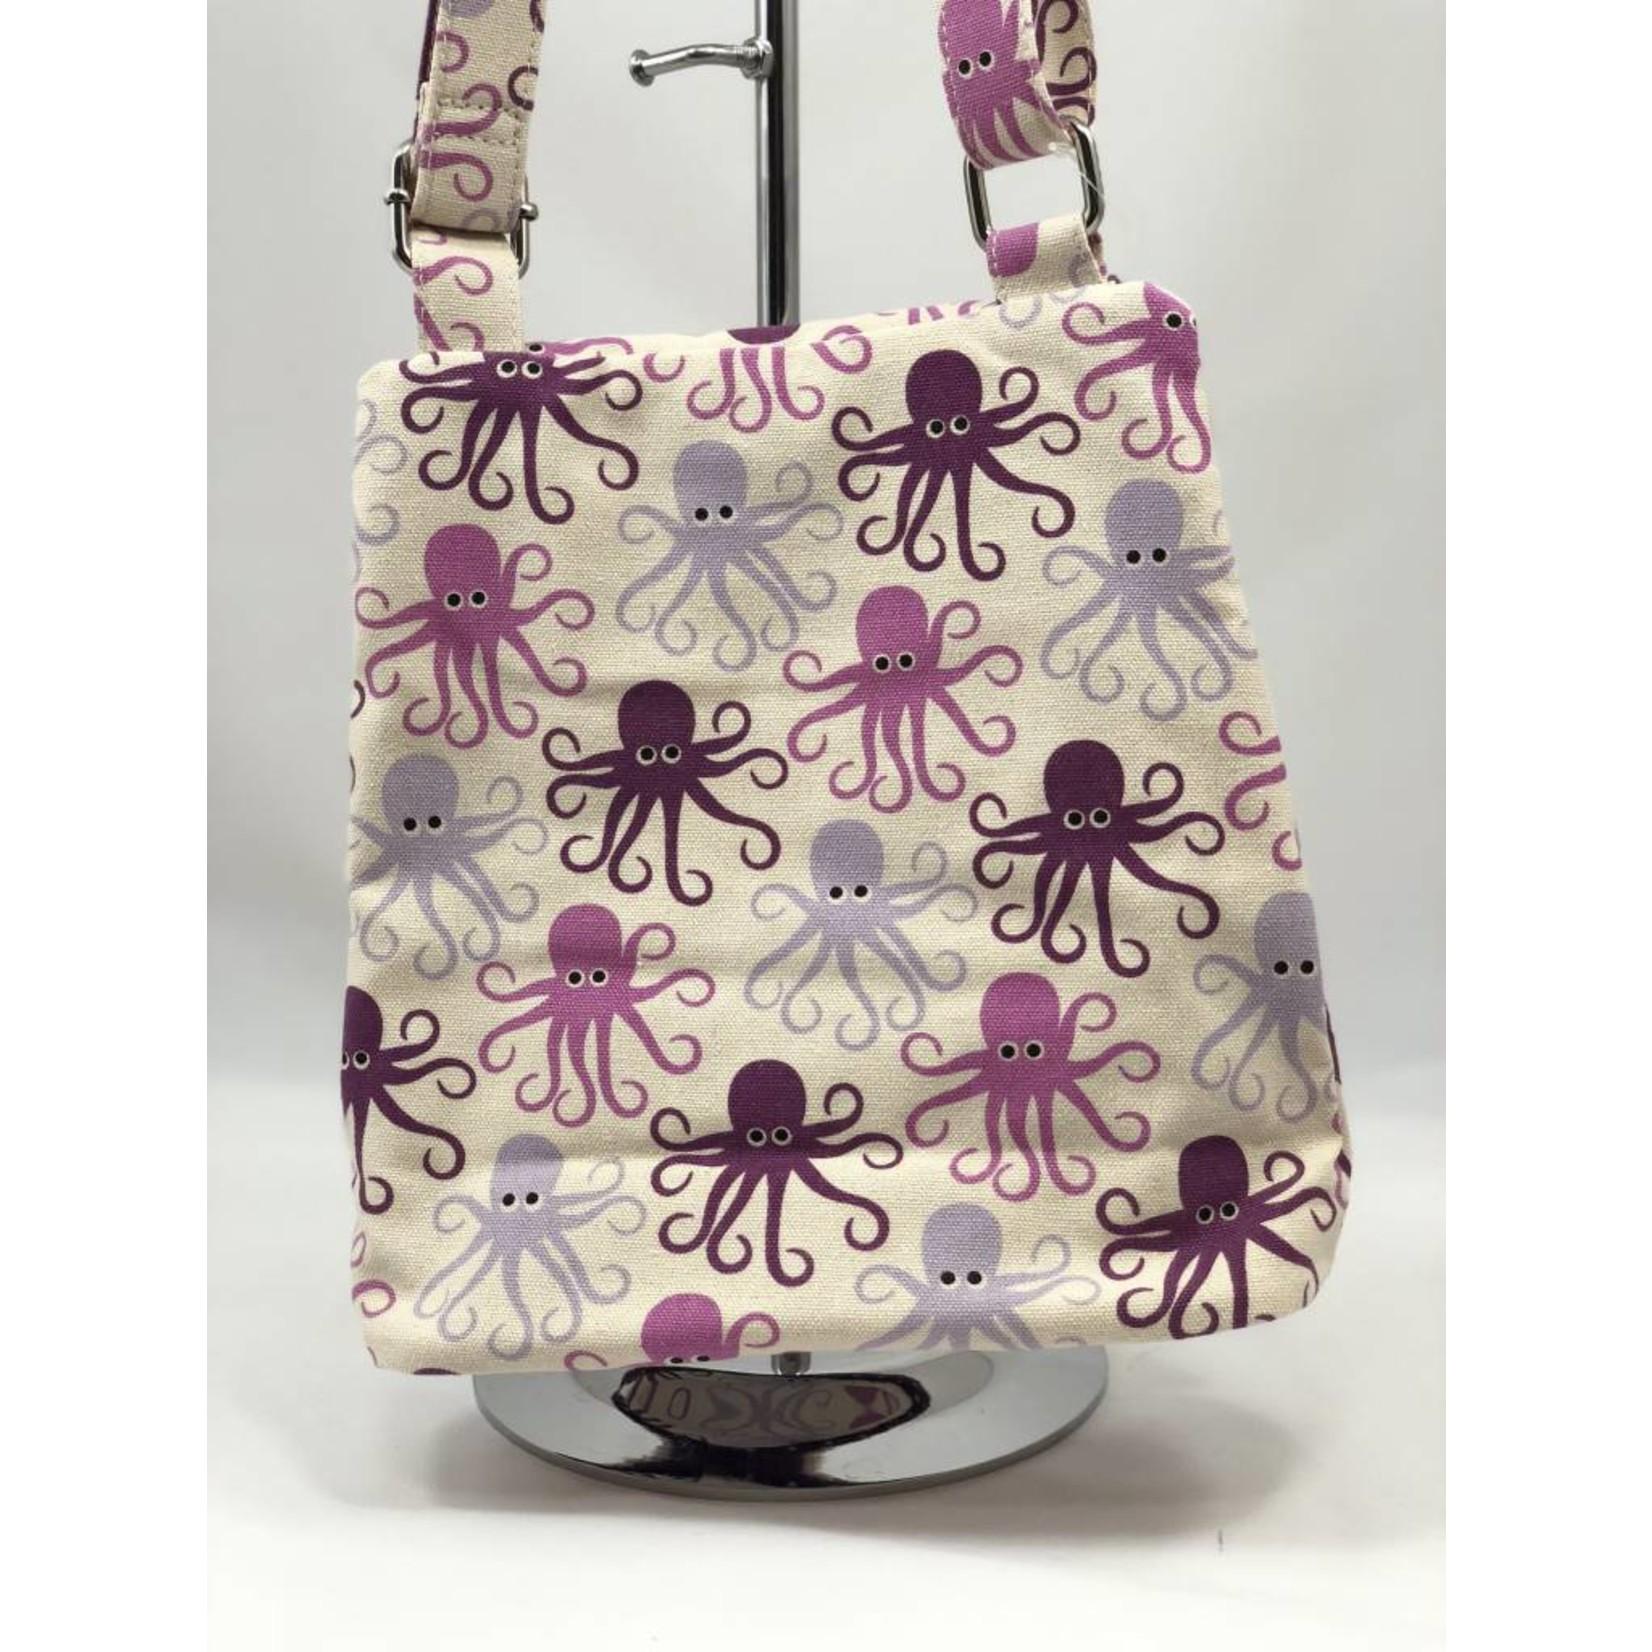 Bungalow 360 Small Messenger Bag - Octopus